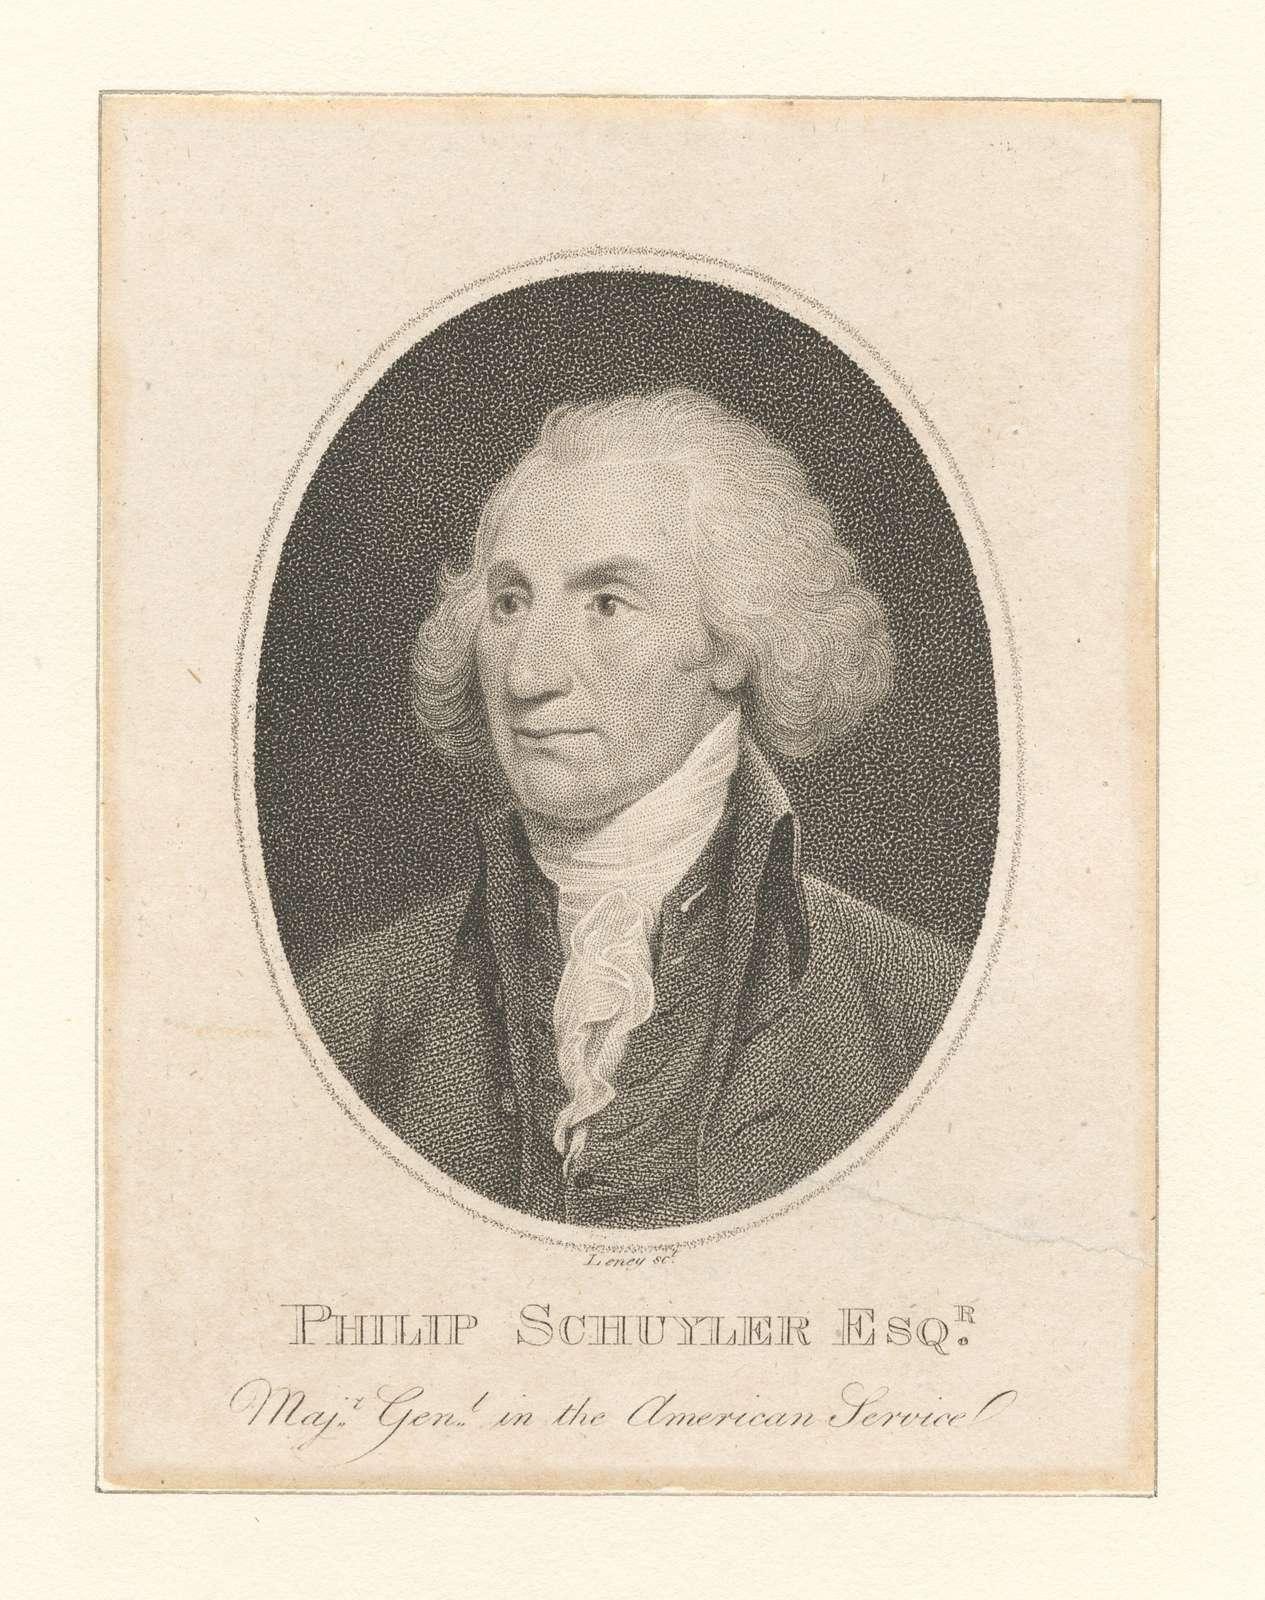 Philip Schuyler Esqr. Majr. Genl. in the American Service